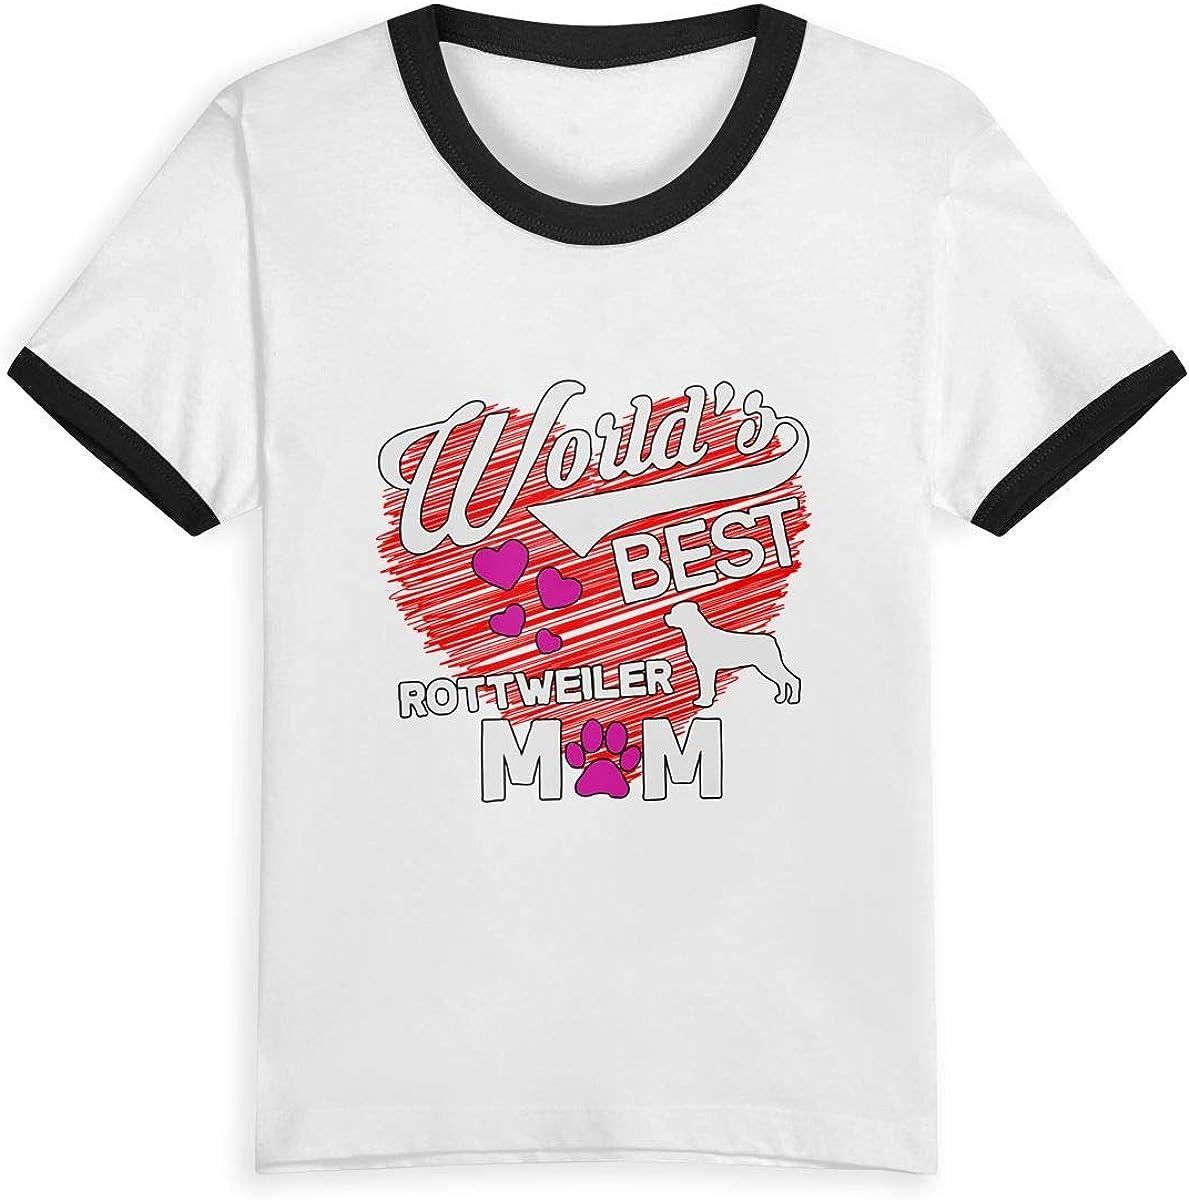 None Brand - Camiseta de manga corta unisex con diseño de ...